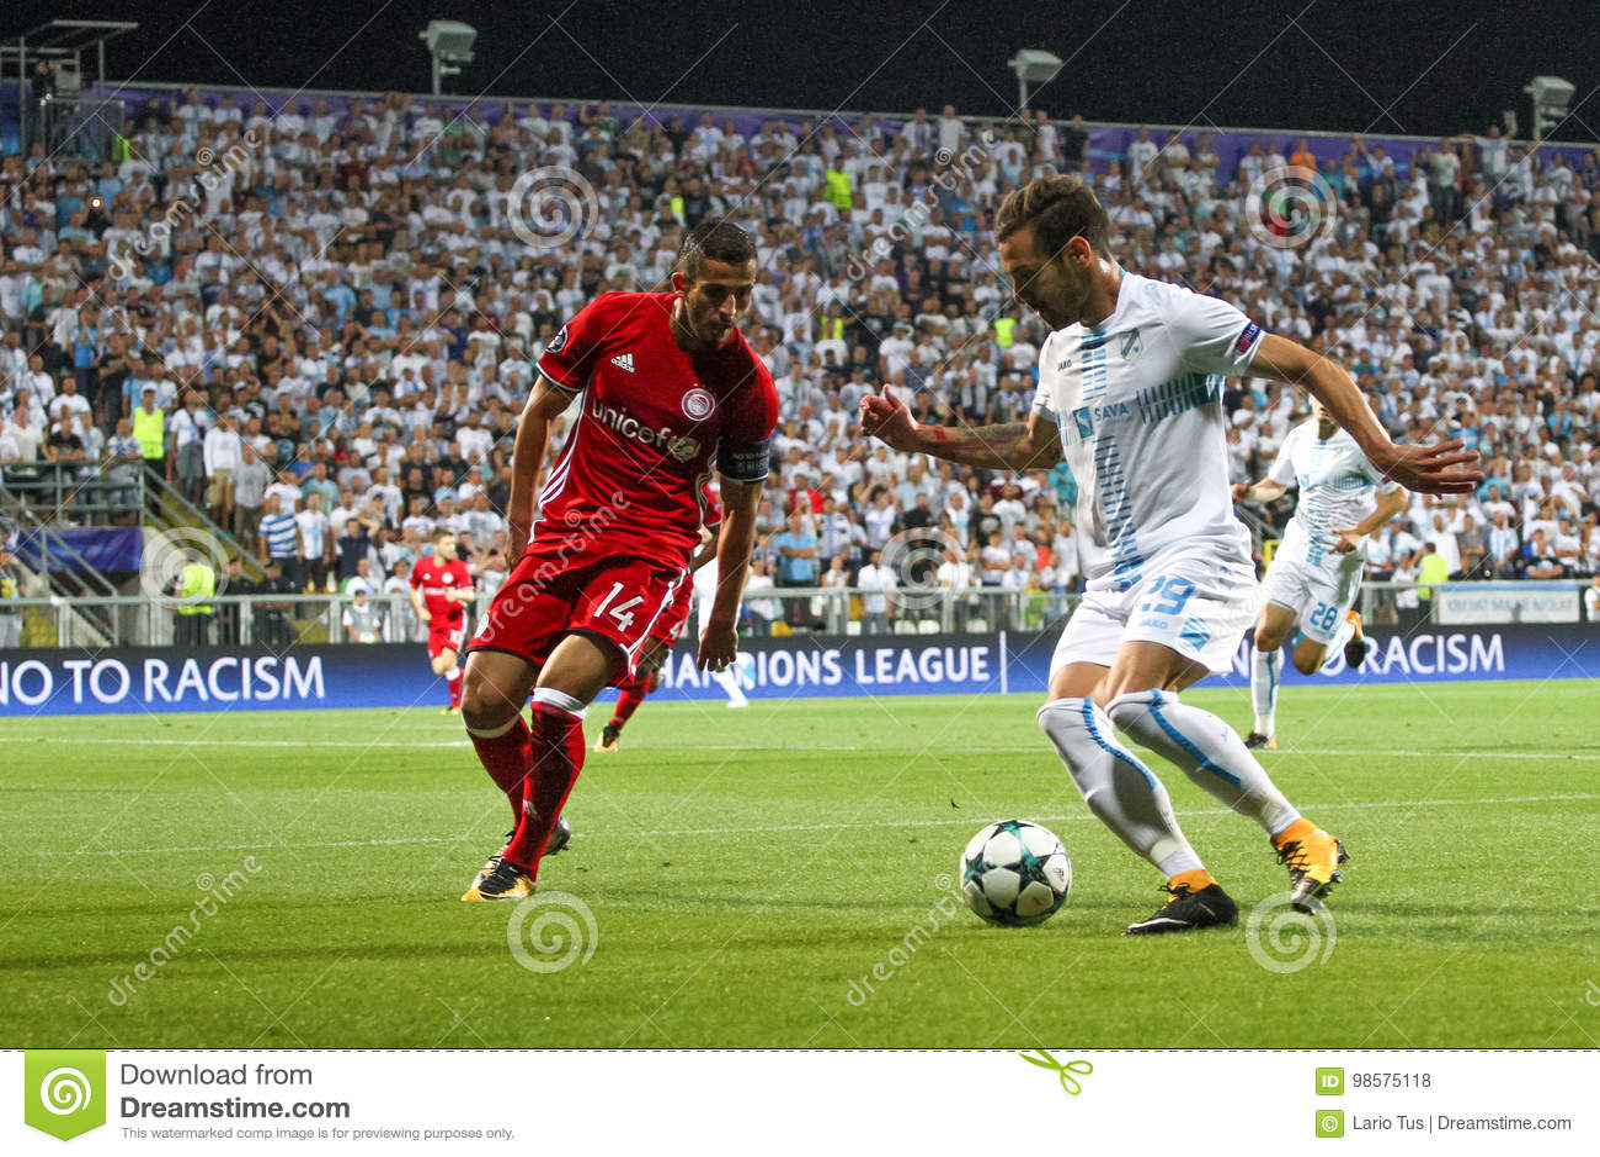 Soccer - UEFA Champions League